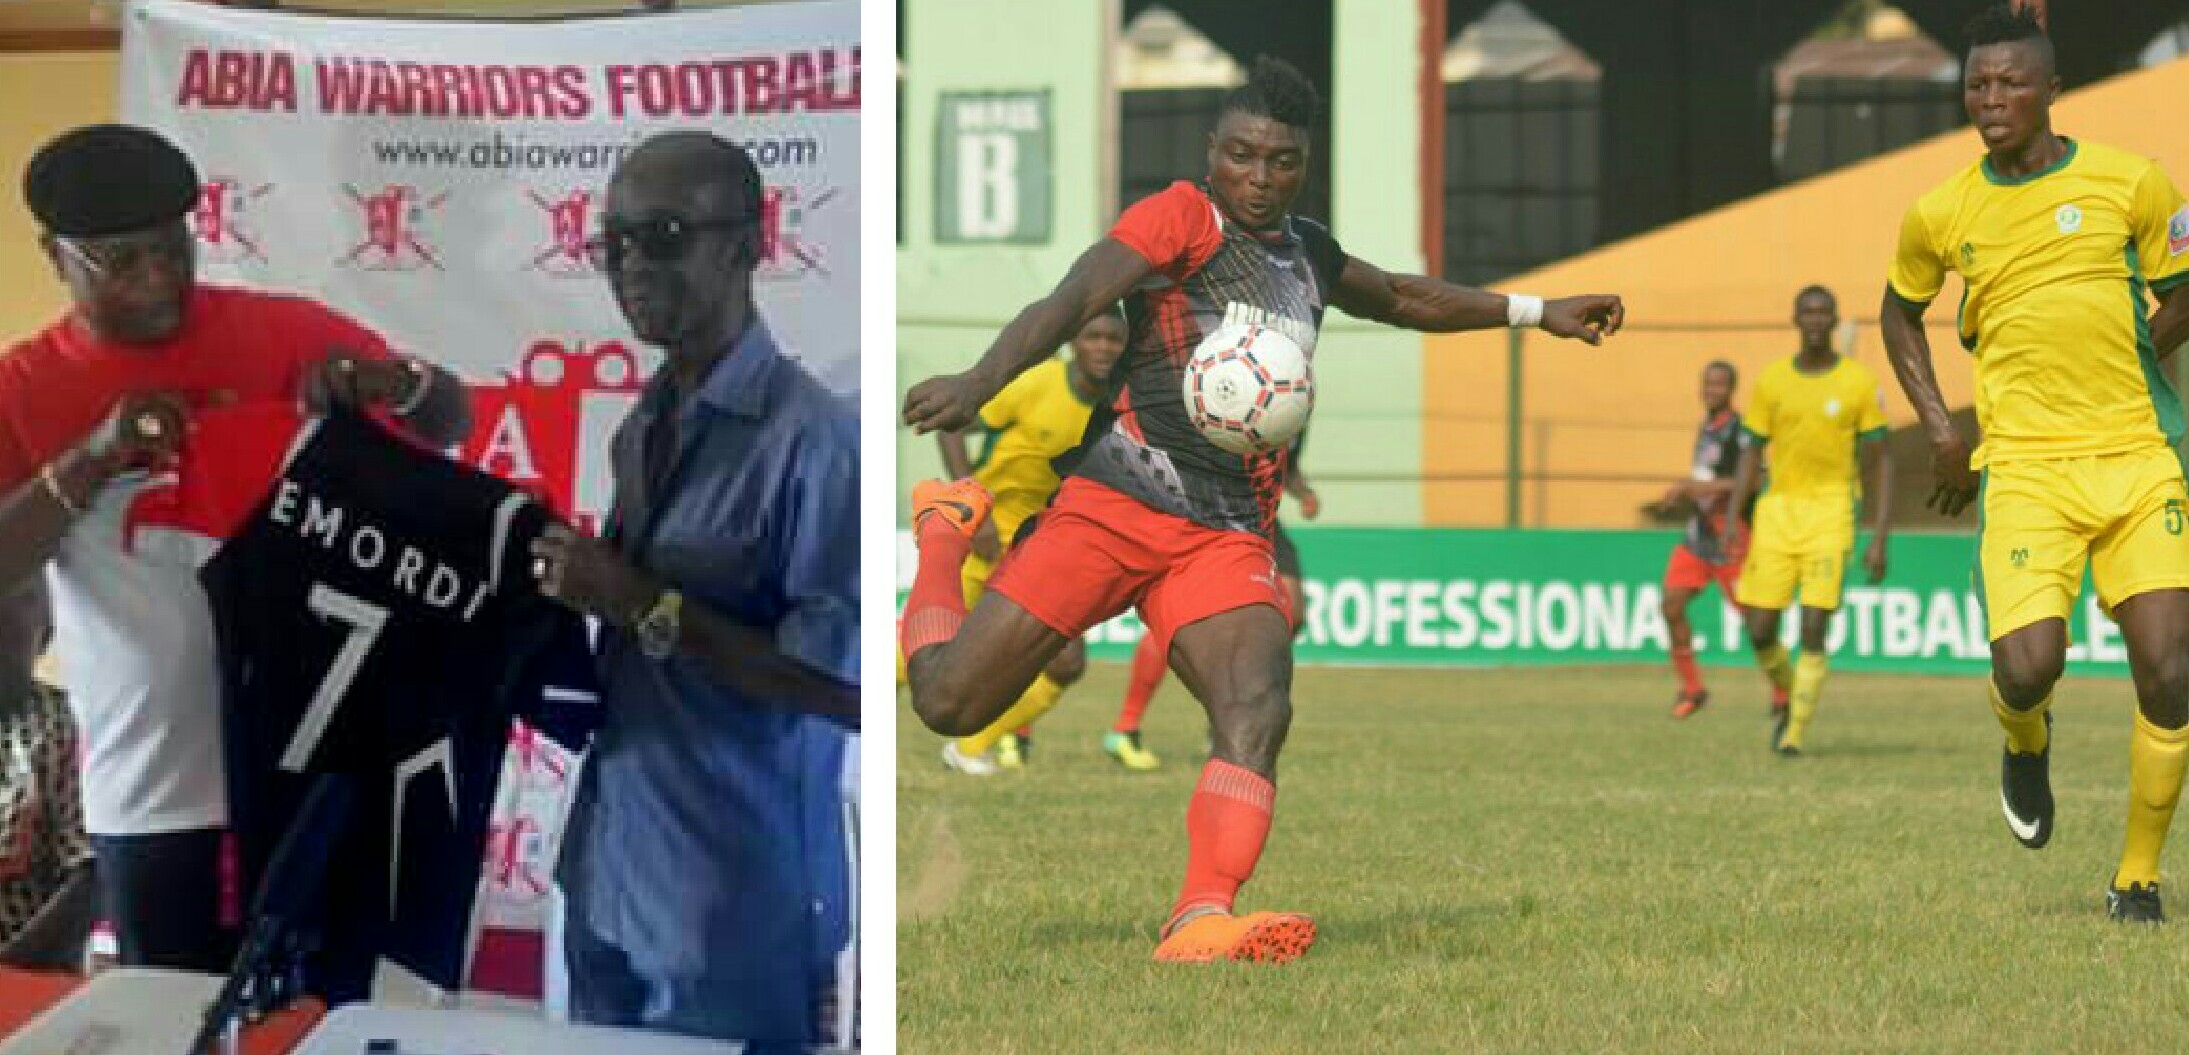 Emordi: Abia Warriors Keen To Maintain Unbeaten Run Against Remo Stars